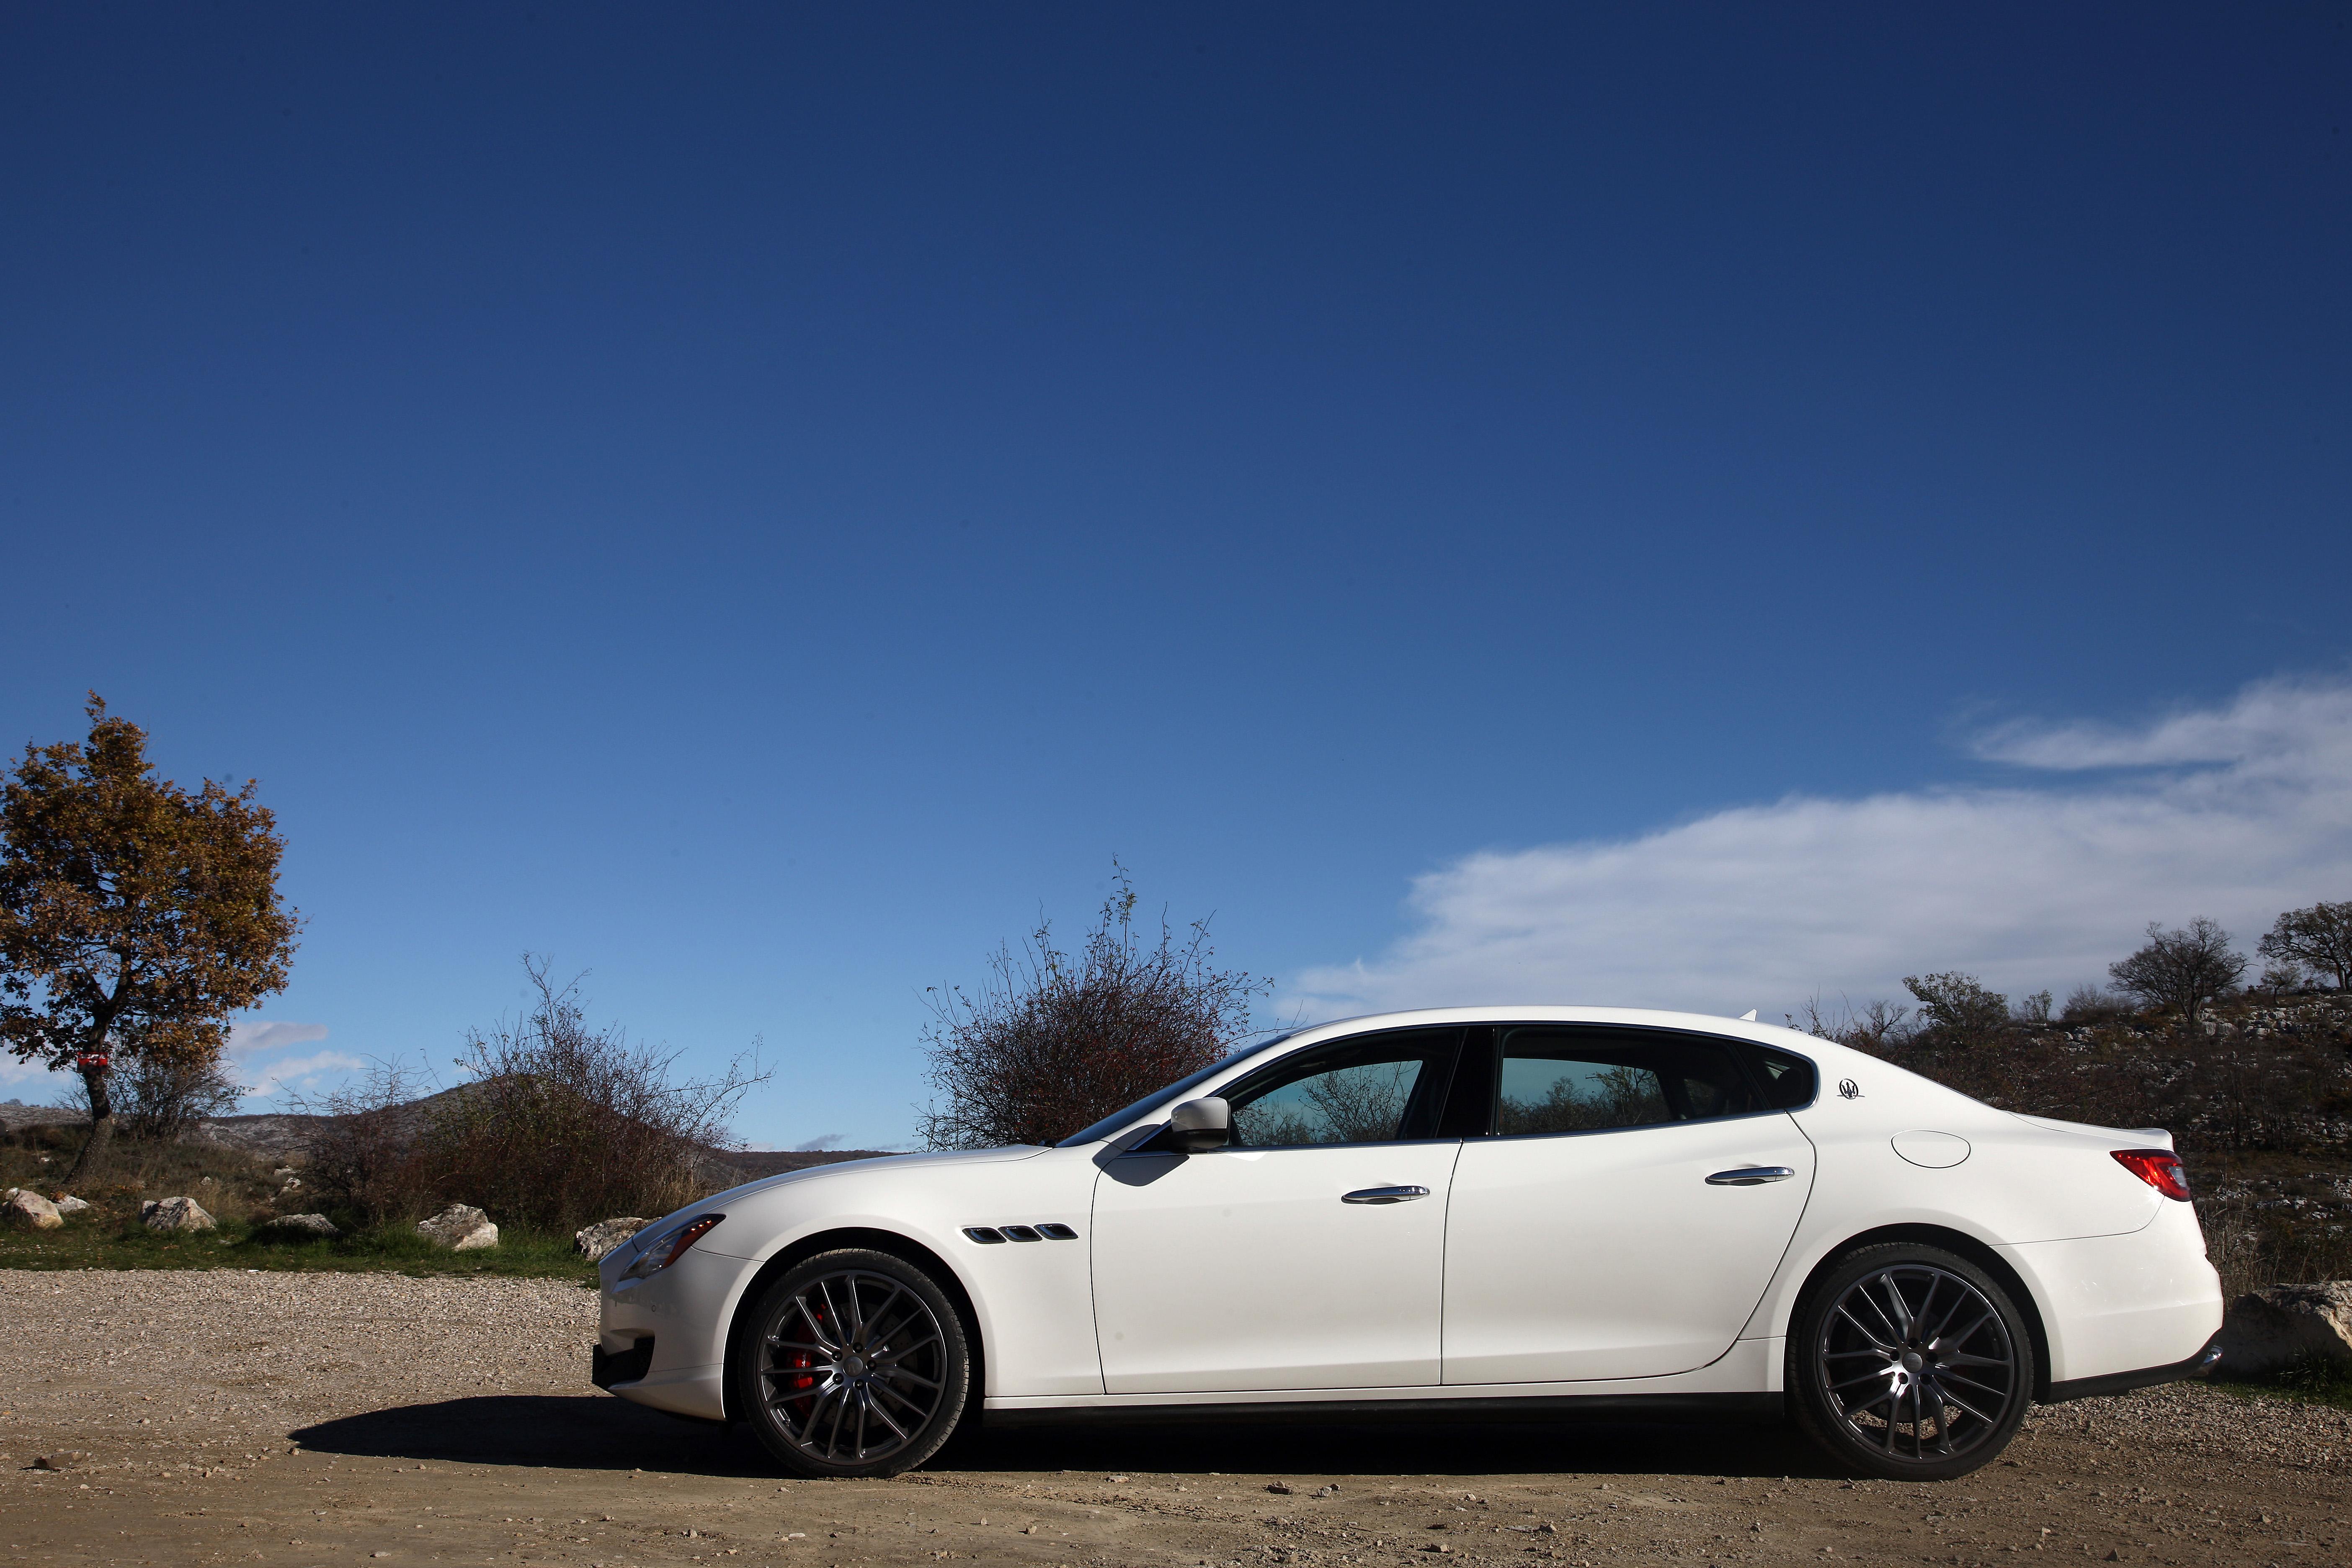 Sixth Gen Maserati Quattroporte Full Details And Gallery